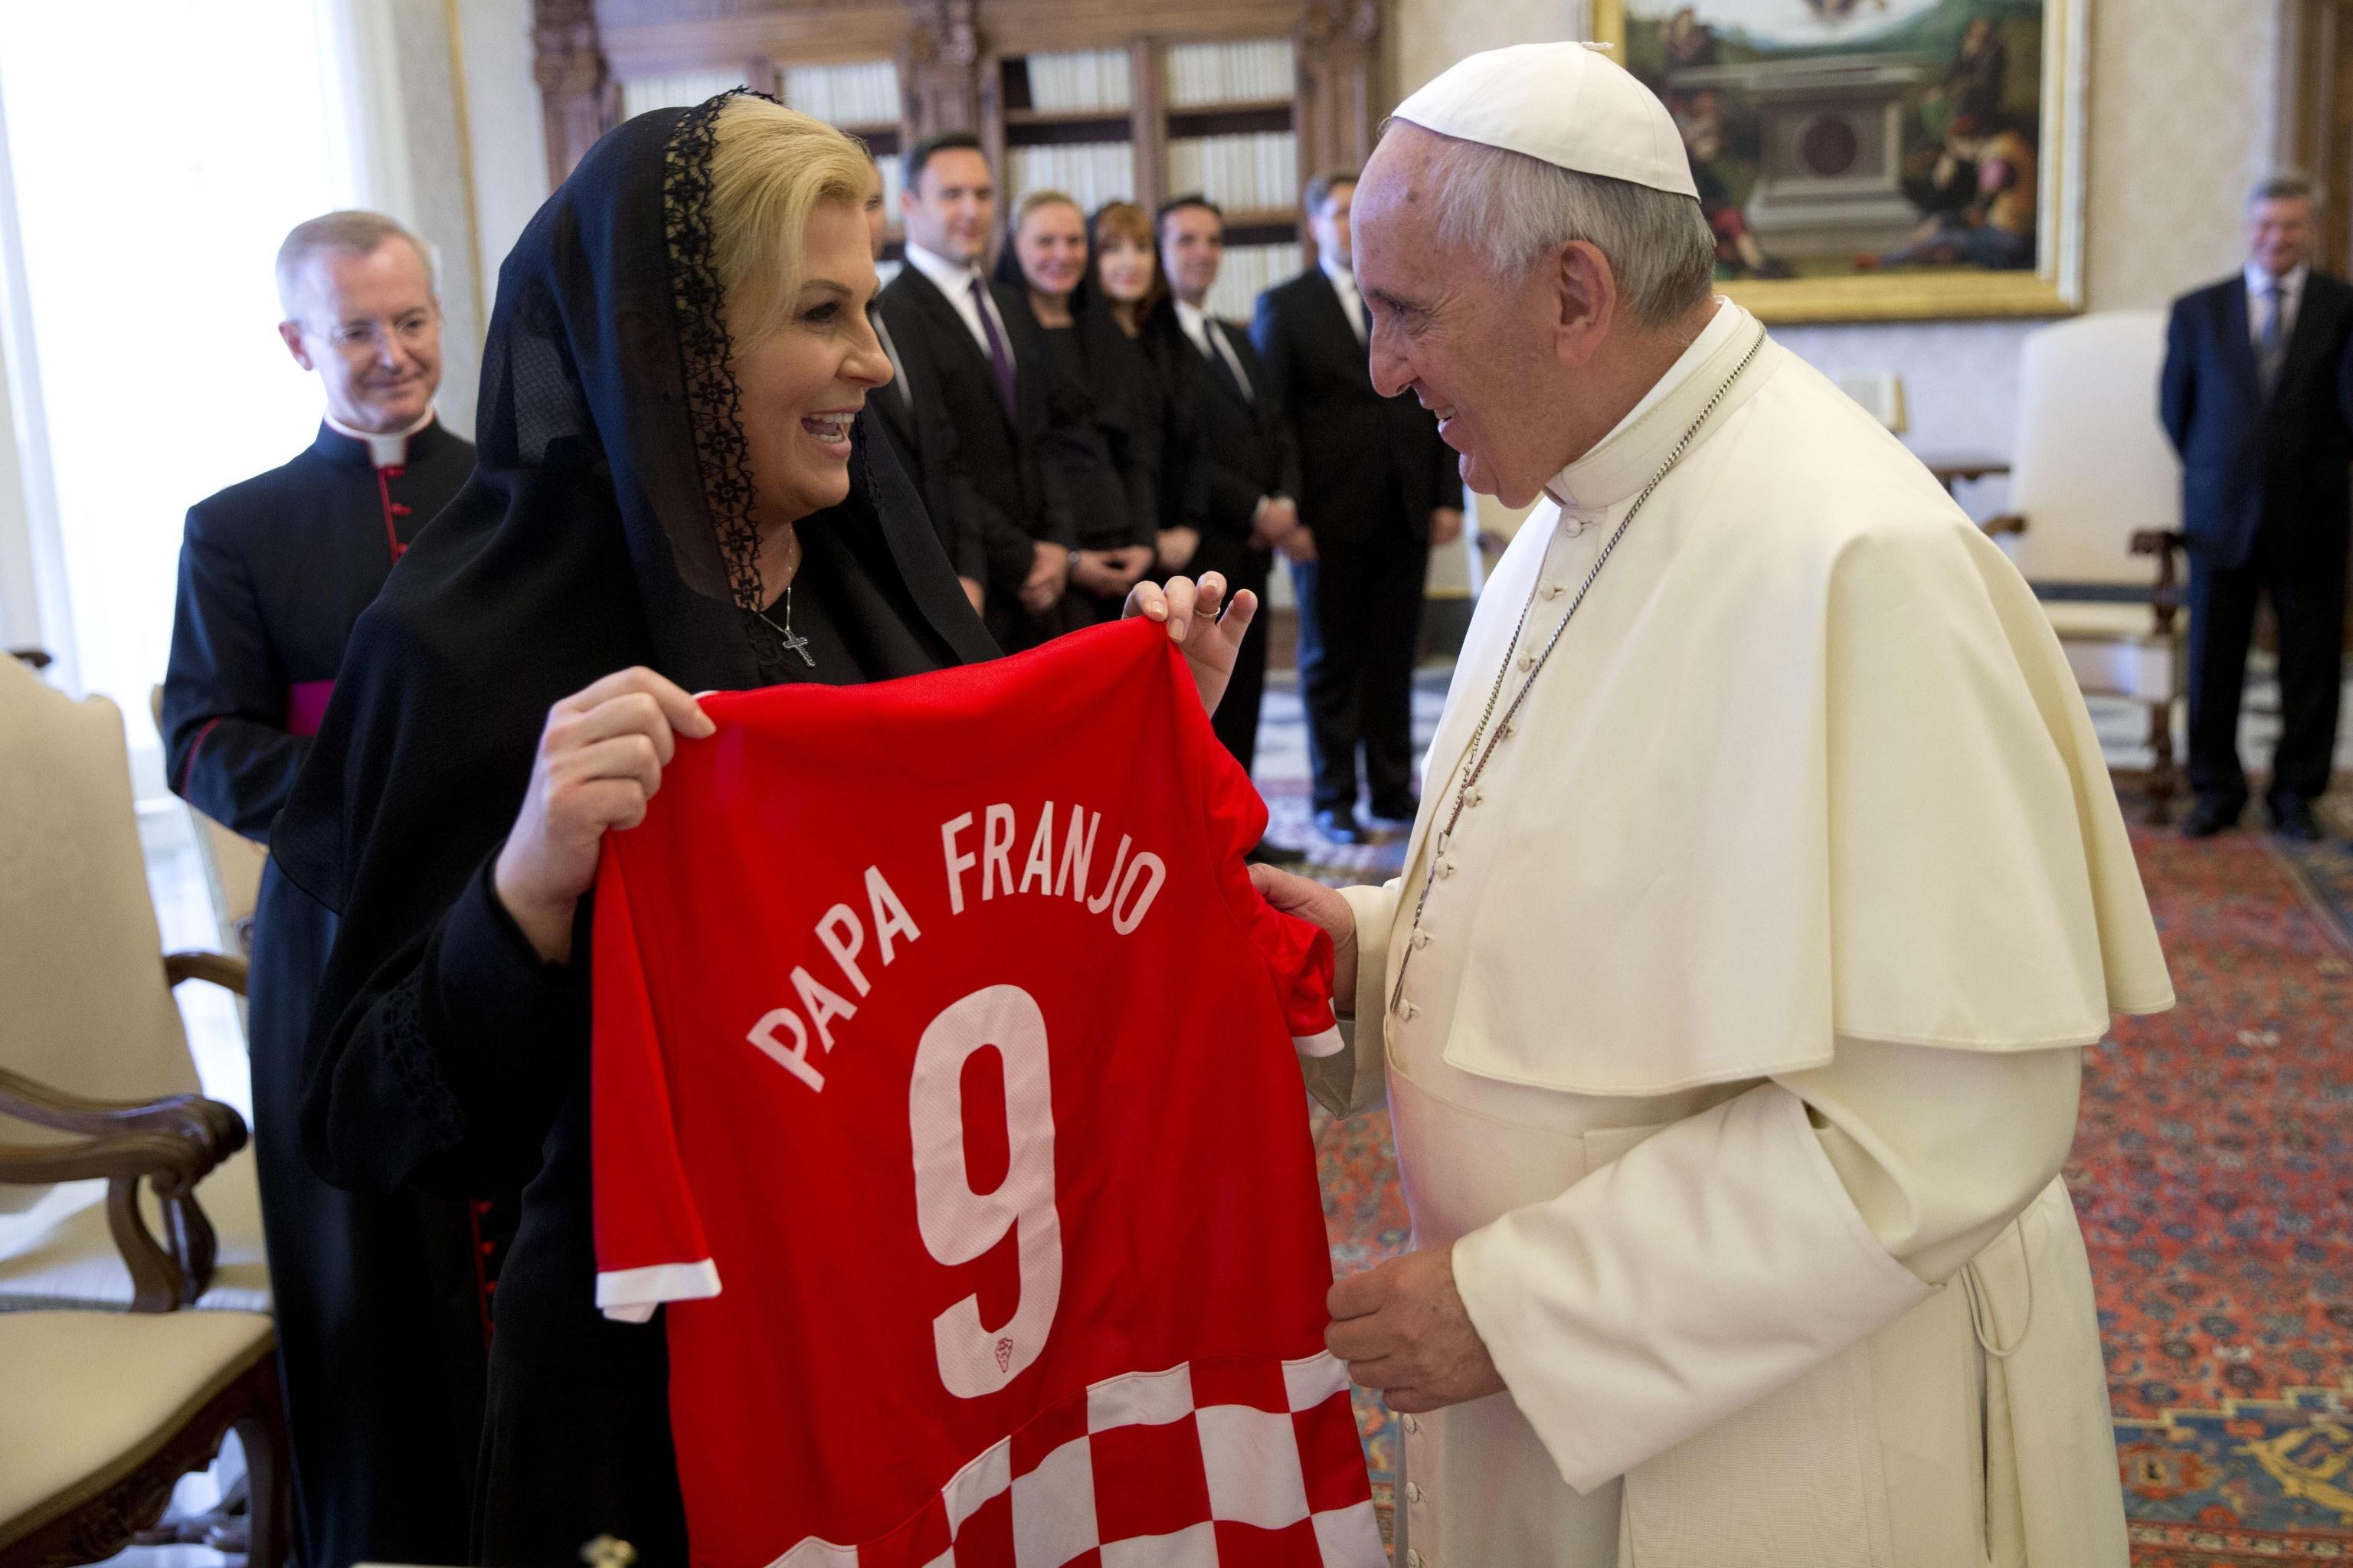 Pope Francis receives a national soccer team jersey bearing his name from Croatia's President Kolinda Grabar Kitarovic